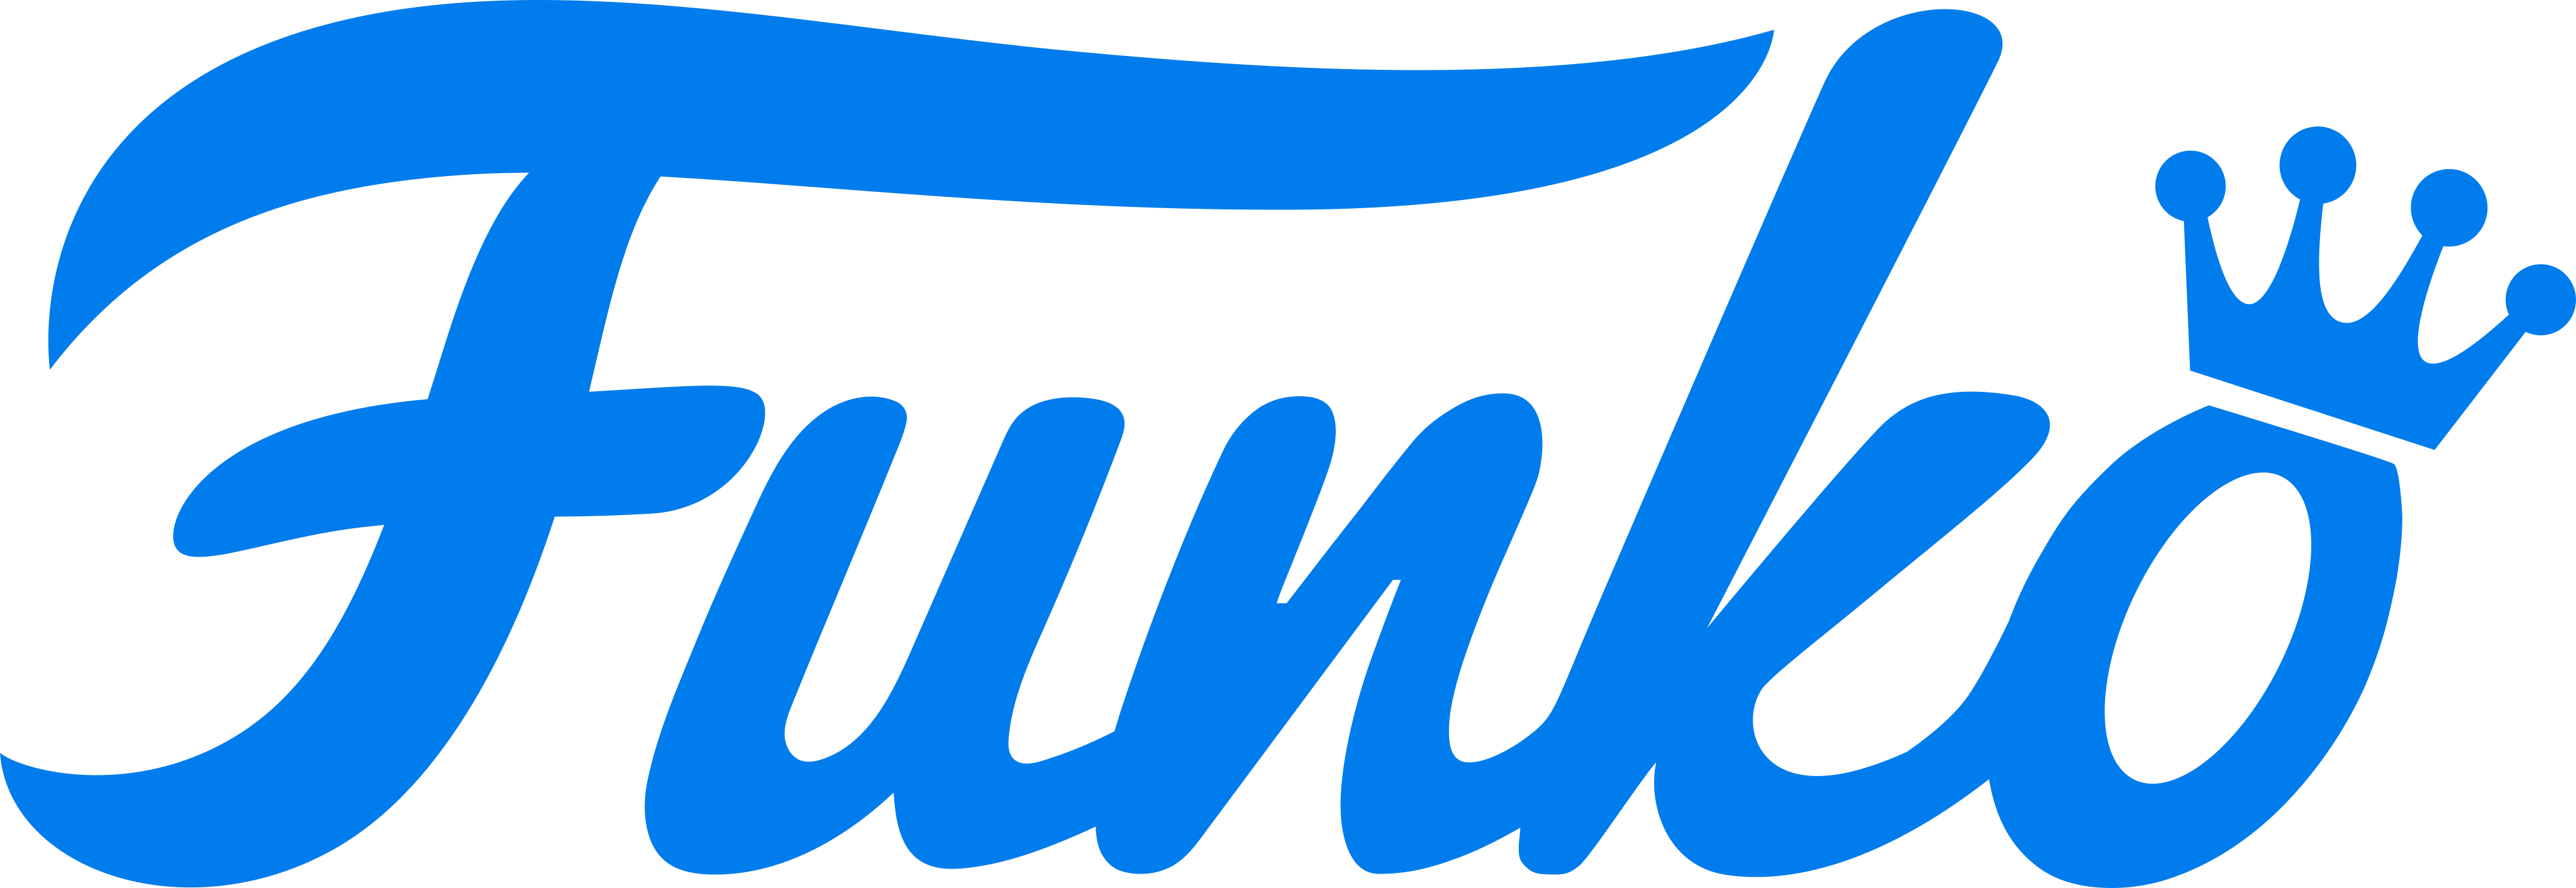 Funko Logo.